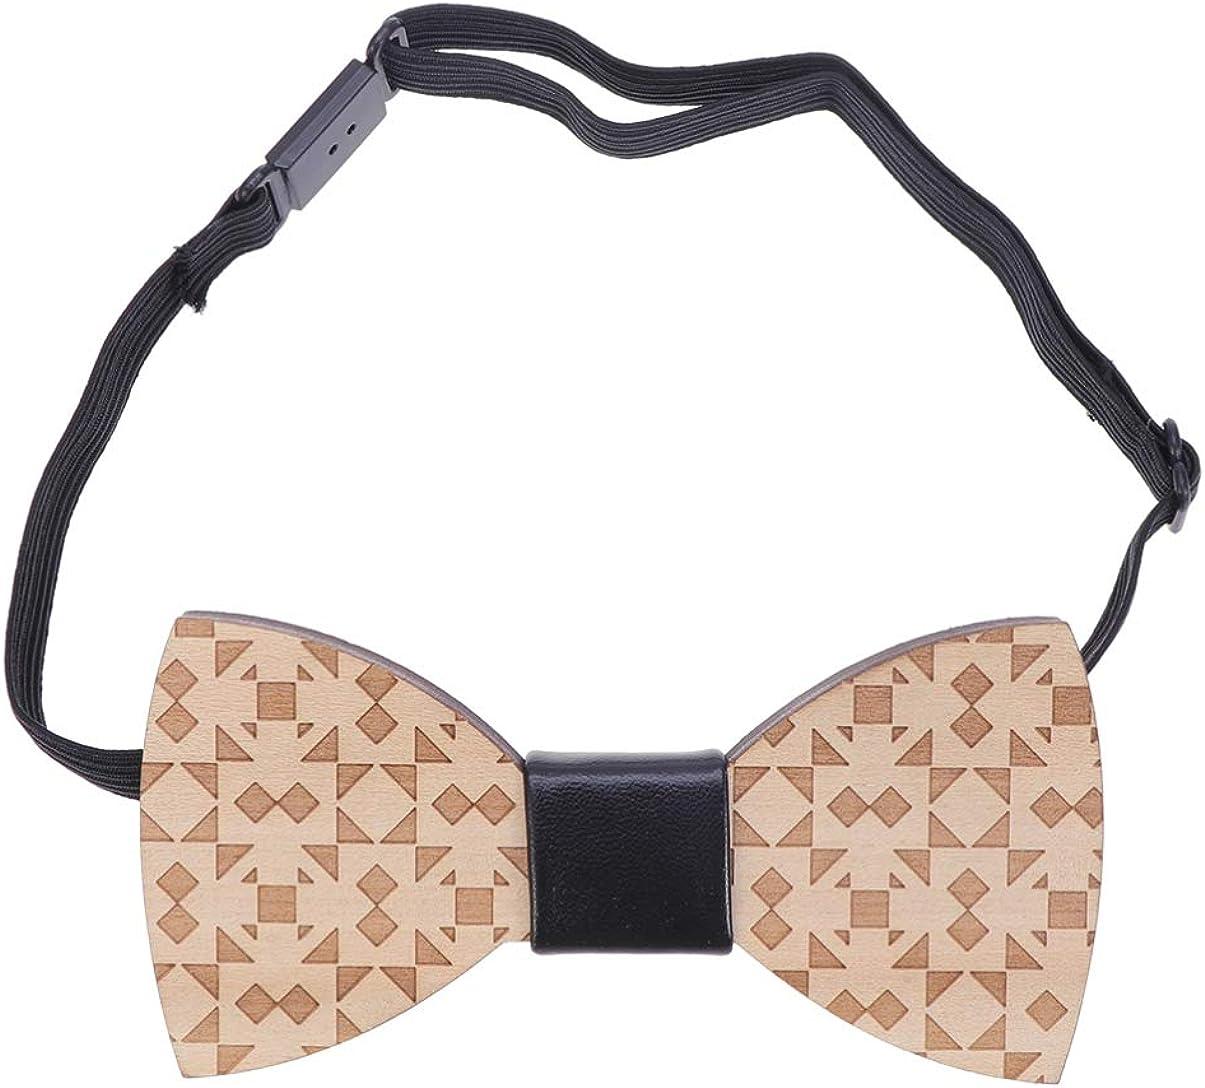 Healifty Wooden Bowtie Geometric Decorative Cravat Clothes Accessory Bow for Festival Party Wedding Decor